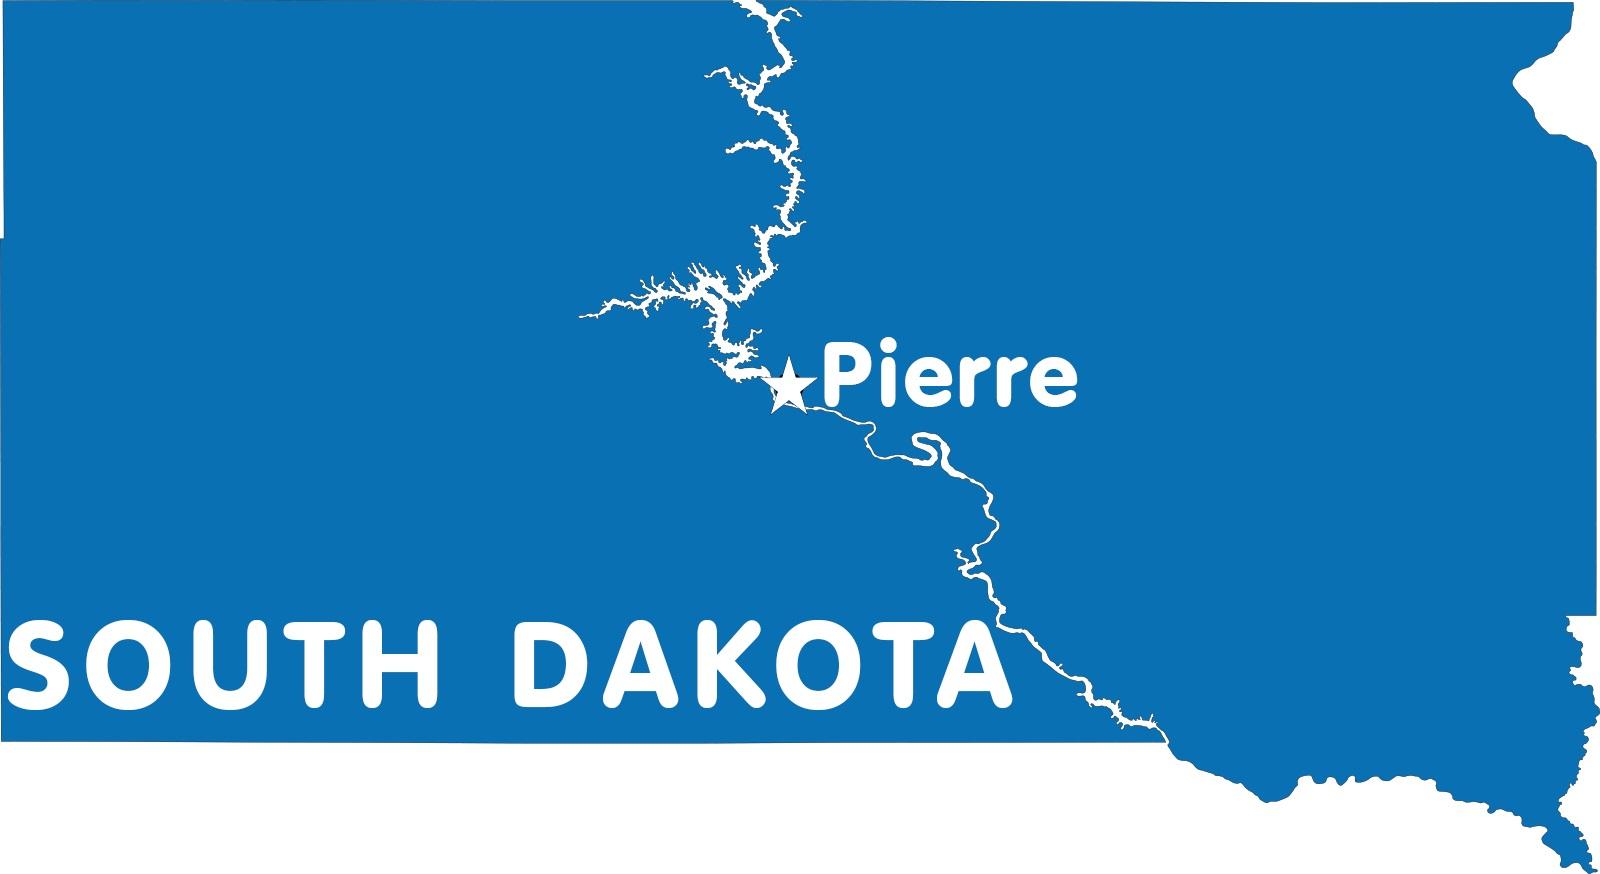 South Dakota Capital Map | Large Printable High Resolution and Standard Map